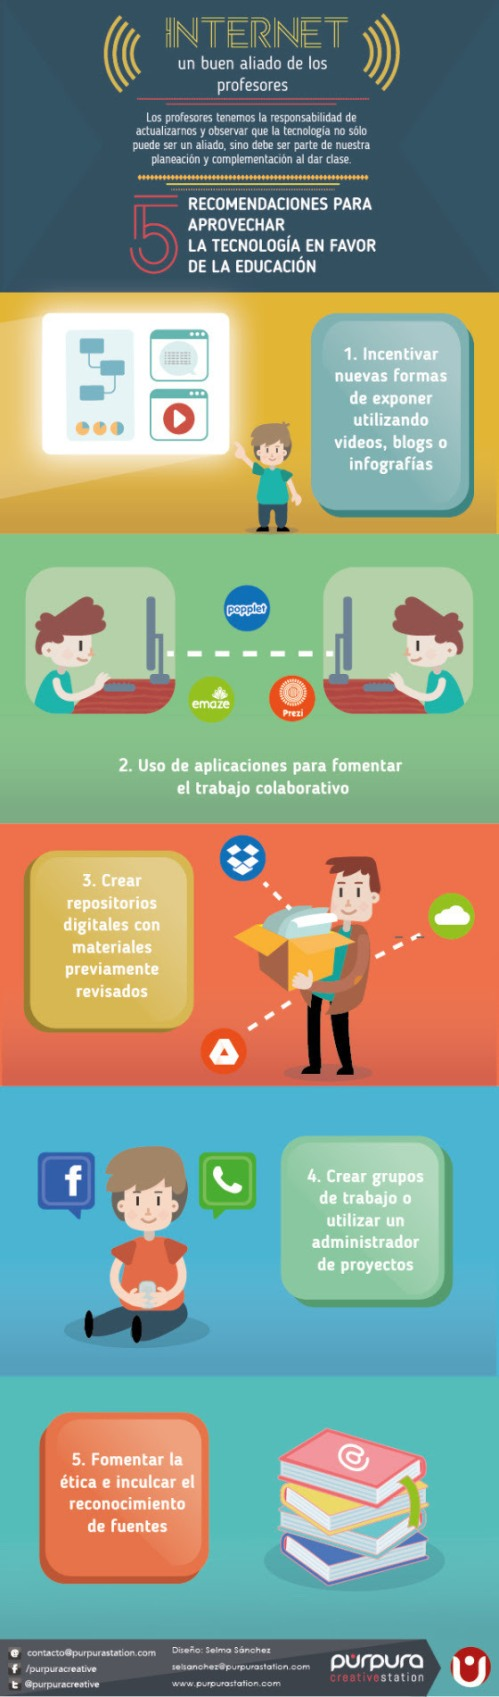 5-usos-internet-educacion-infografia